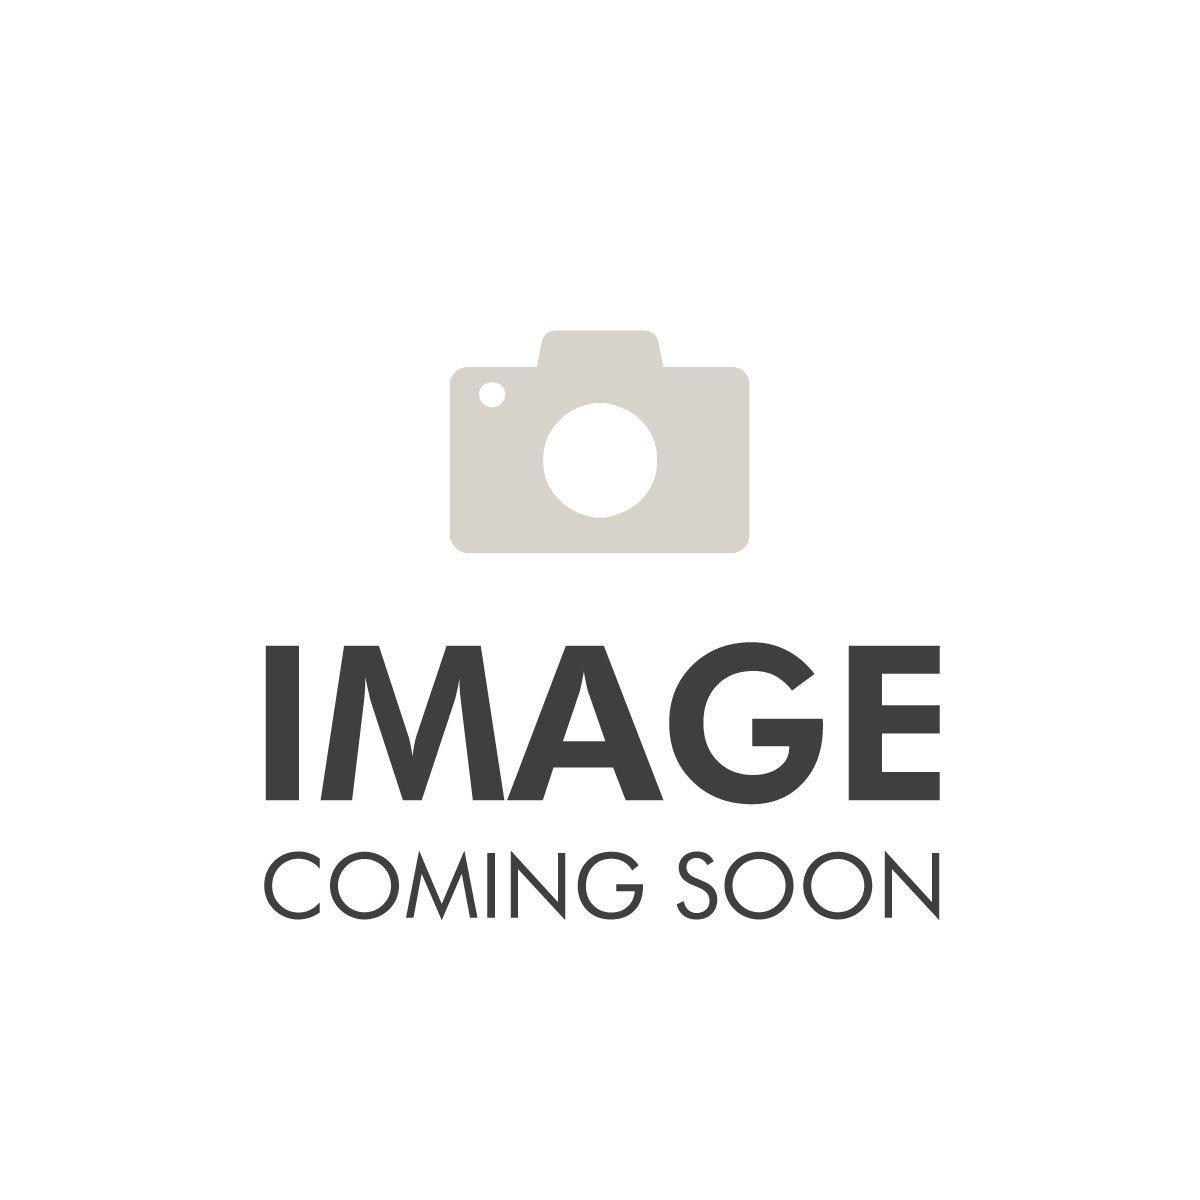 Lancome Genifique Nutrics Nourishing Youth Activating Cream Dry Skin 50ml